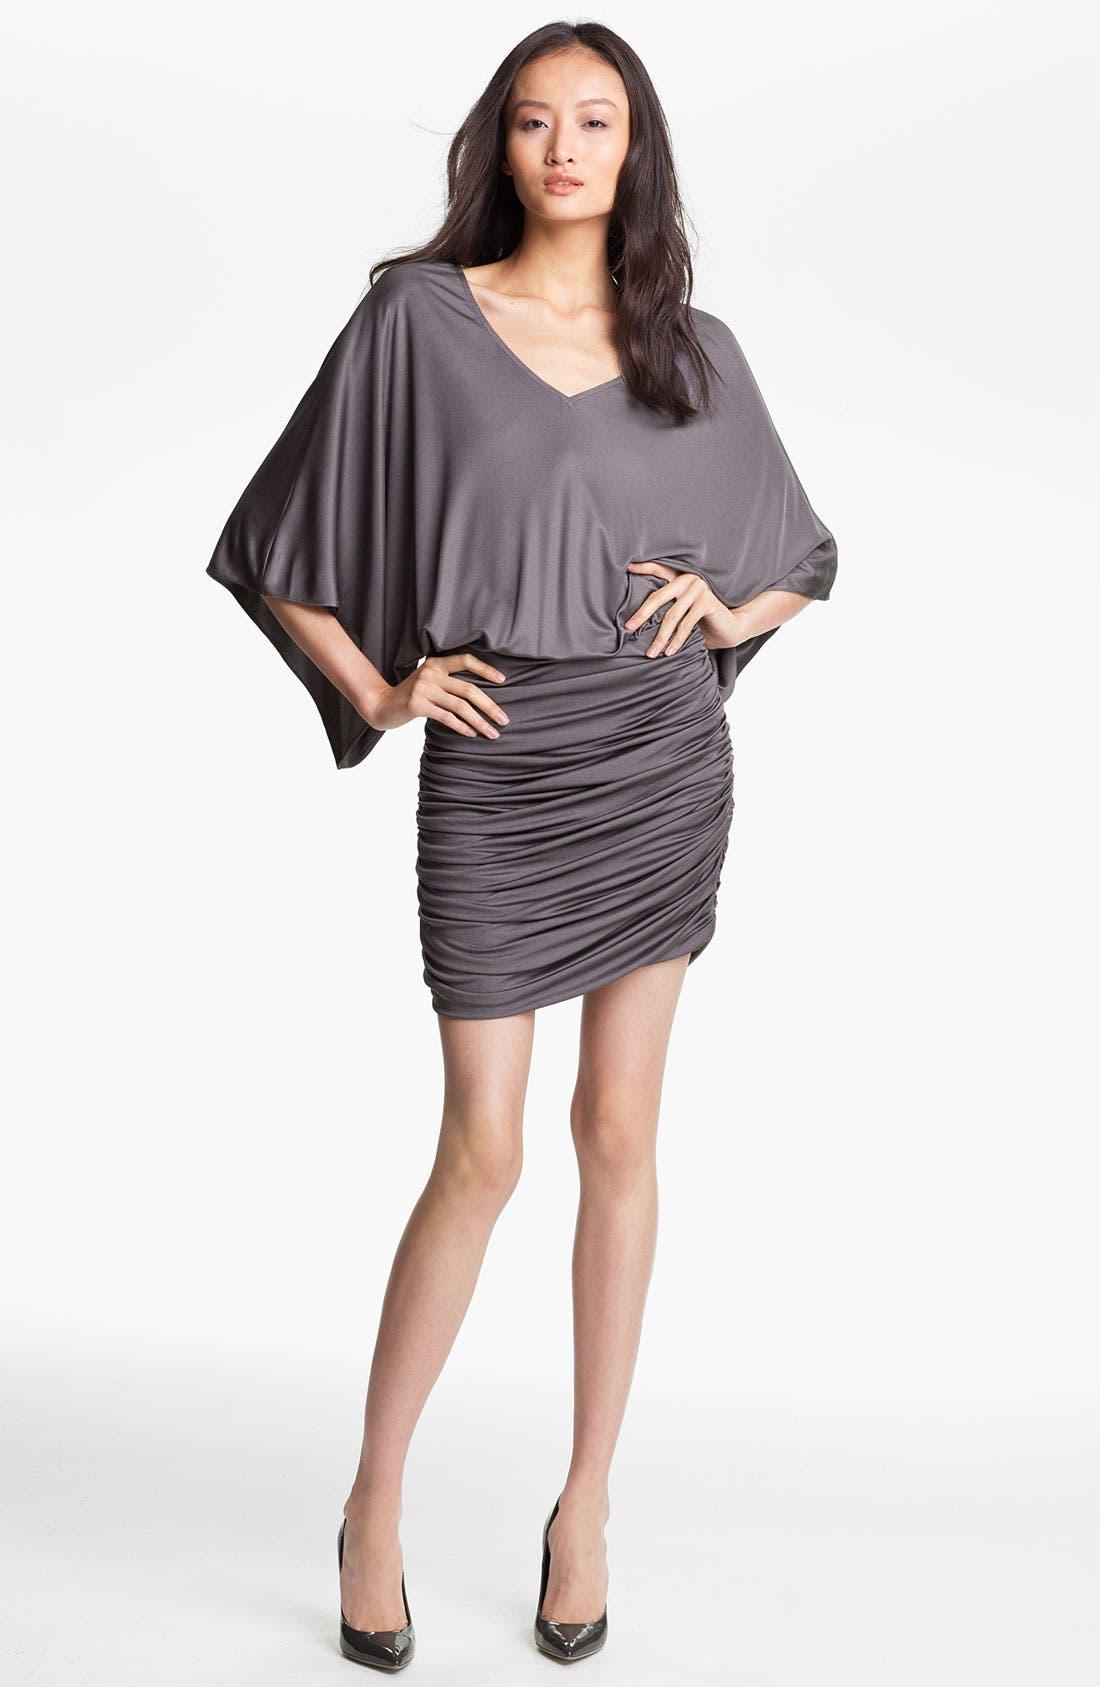 Main Image - Jay Godfrey 'Marea' Ruched Skirt Dress